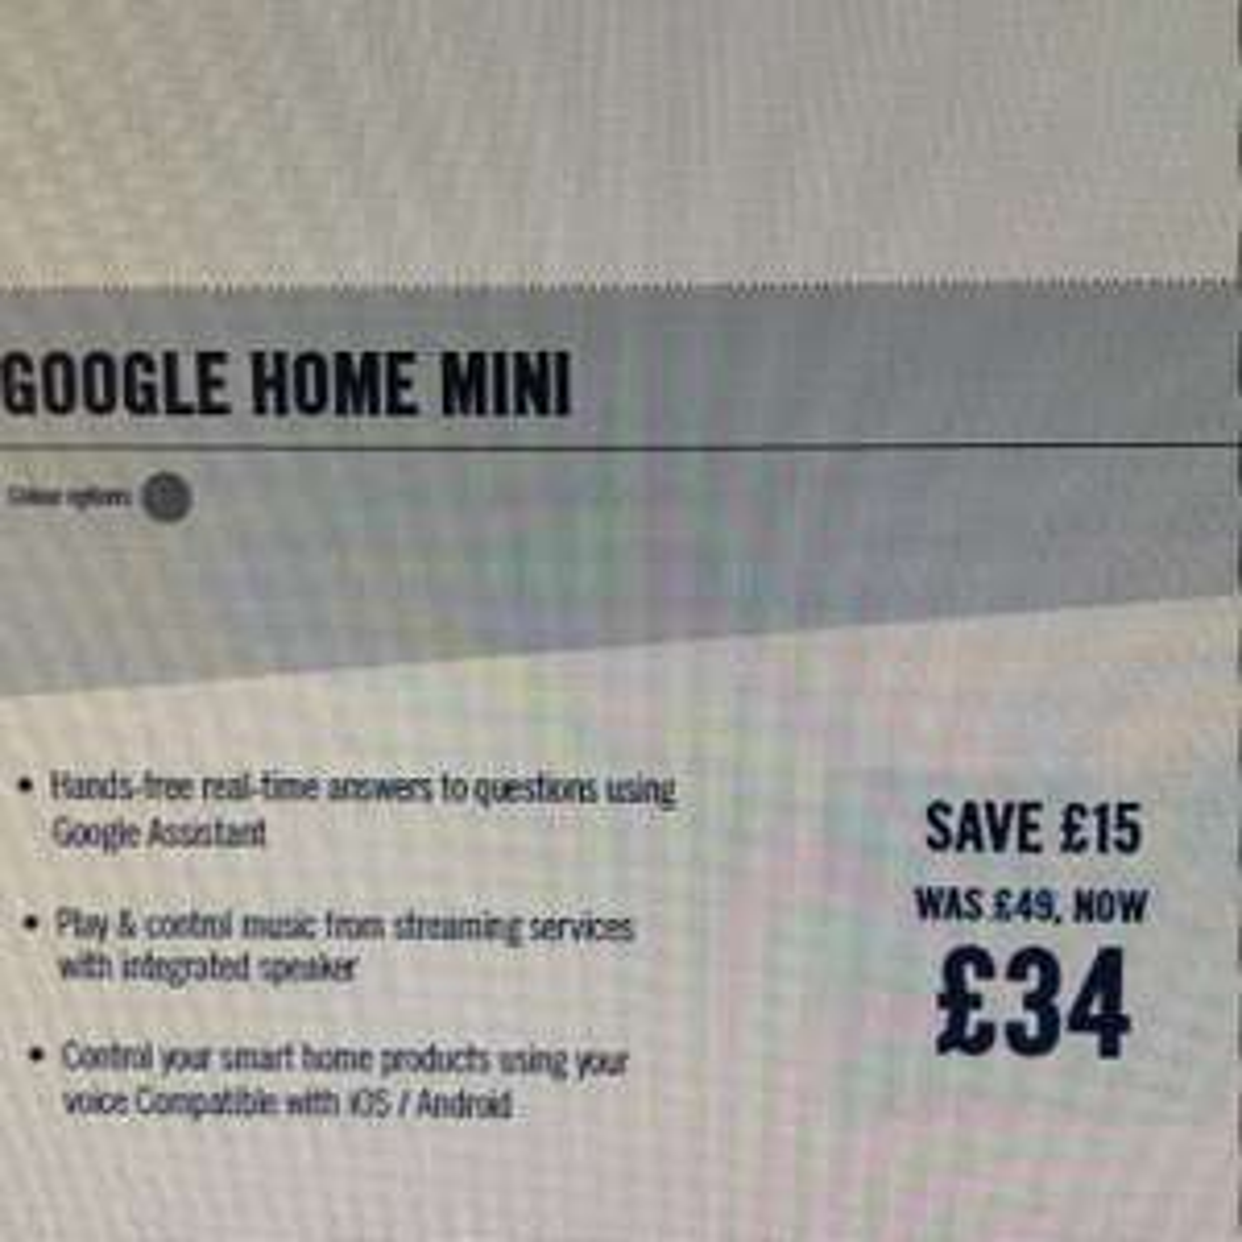 ***goes live on MONDAY*** Google Home Mini £34 @ Carphone warehouse